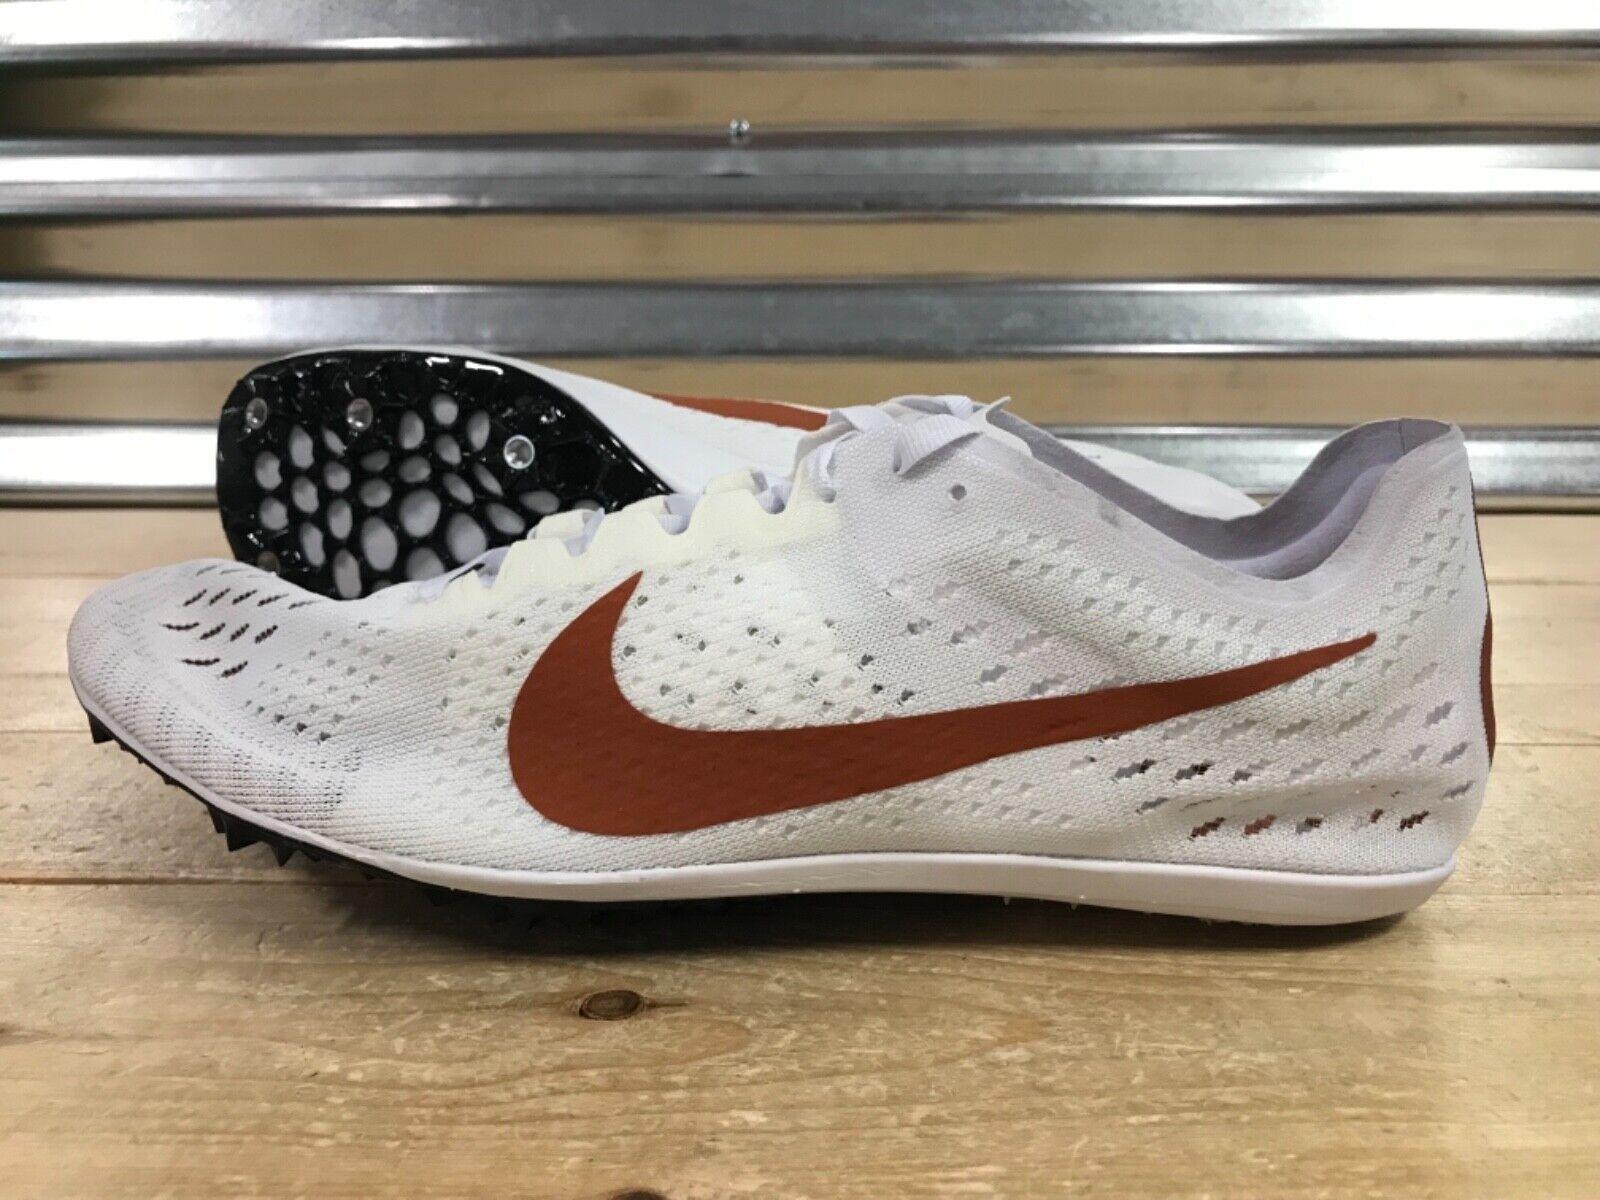 Nike Zoom Victory Elite Texas Longhorns Track Spikes orange SZ ( AA6447-180 )